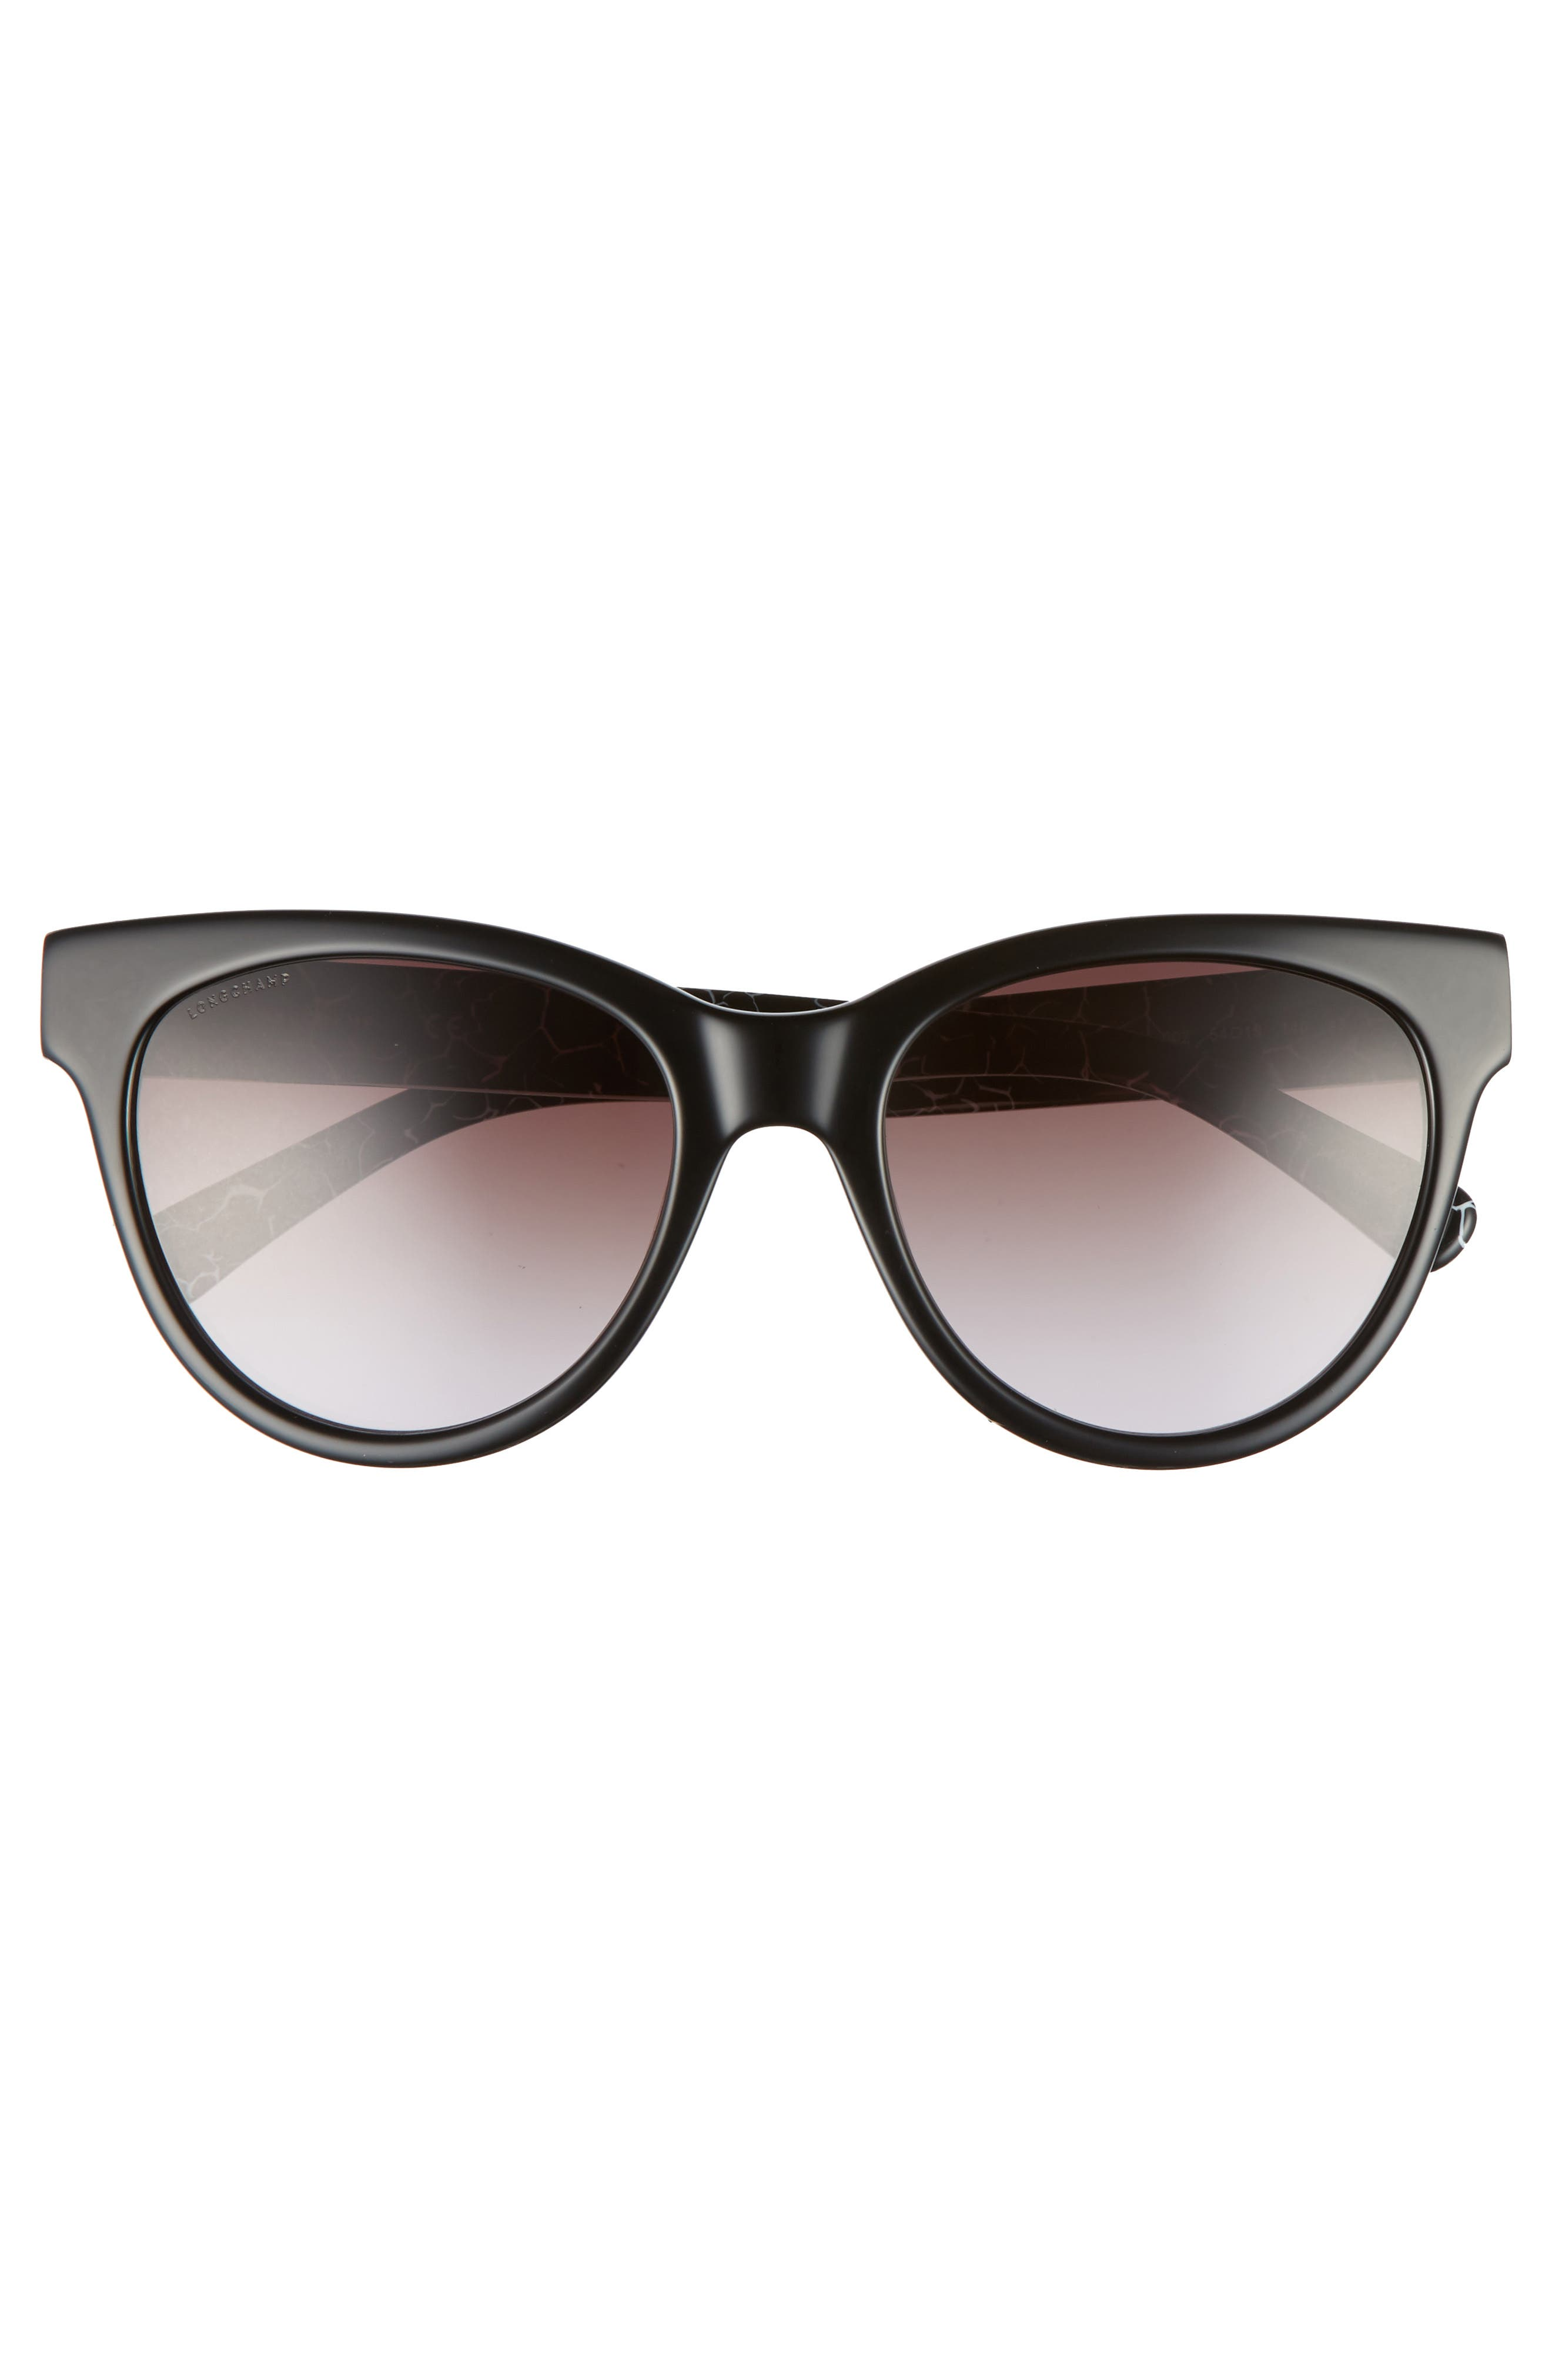 54mm Gradient Lens Cat Eye Sunglasses,                             Alternate thumbnail 3, color,                             MARBLE BLACK